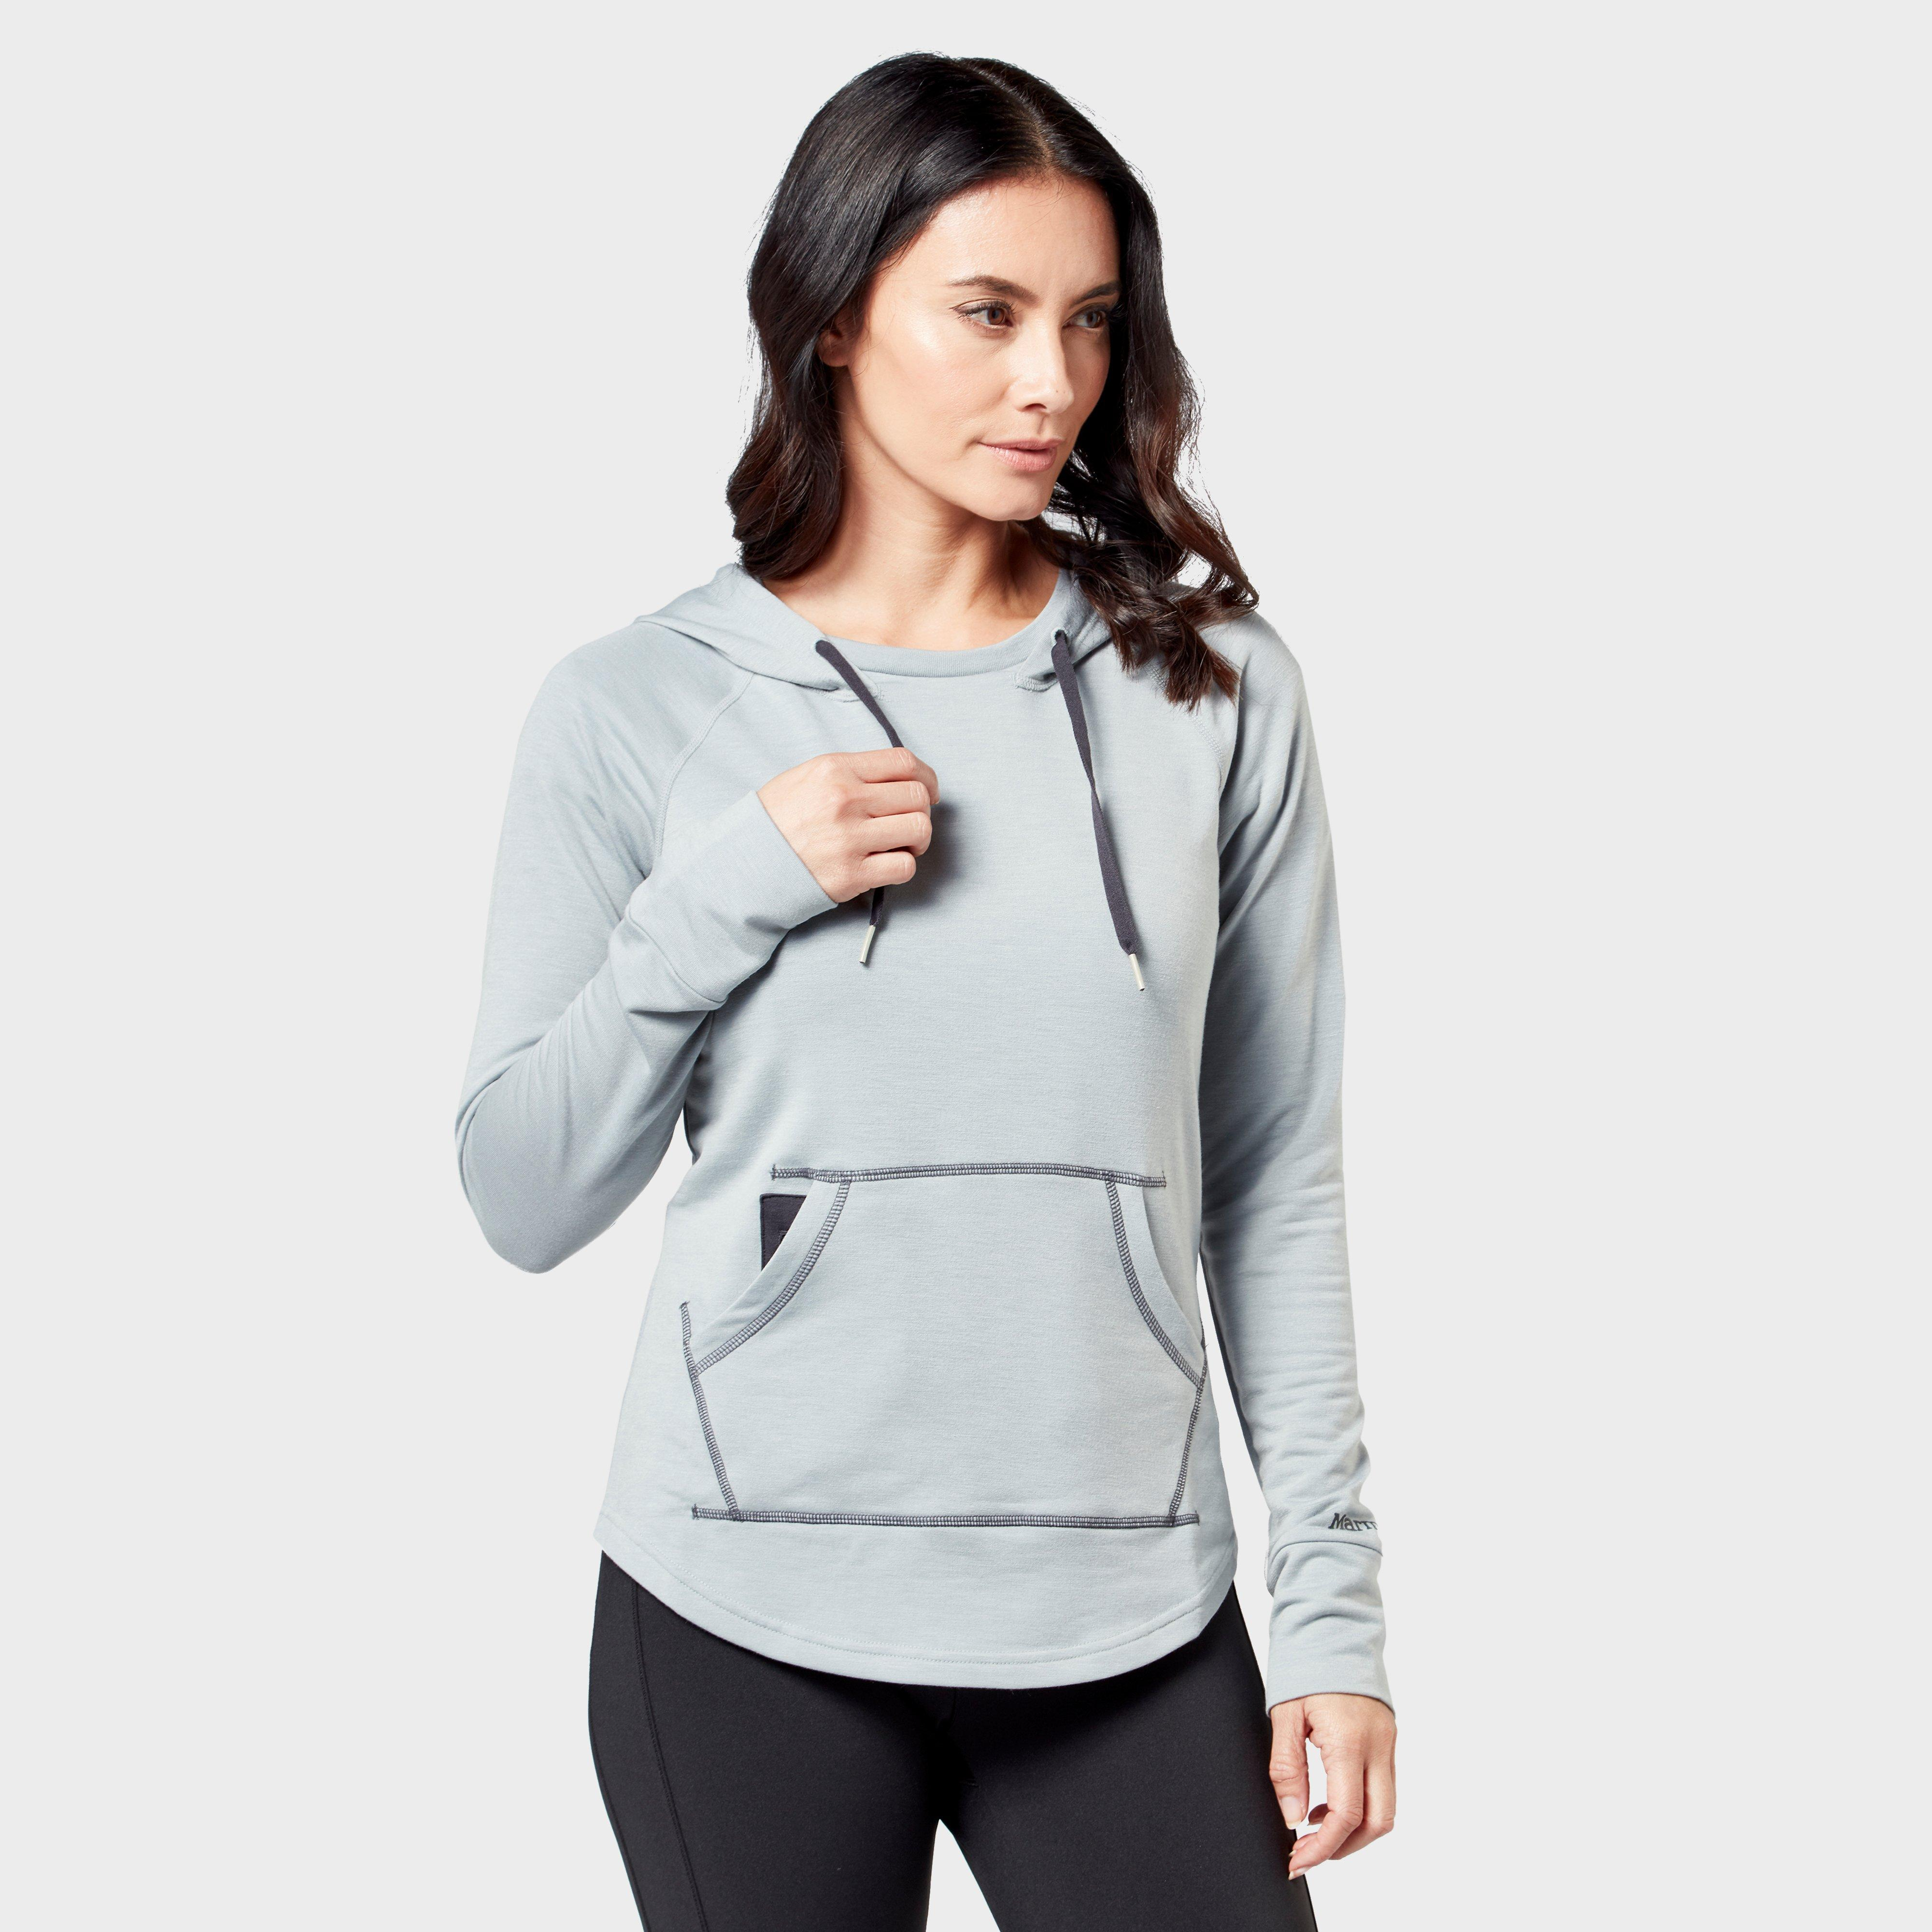 Marmot Women's La Linea Pullover, Grey